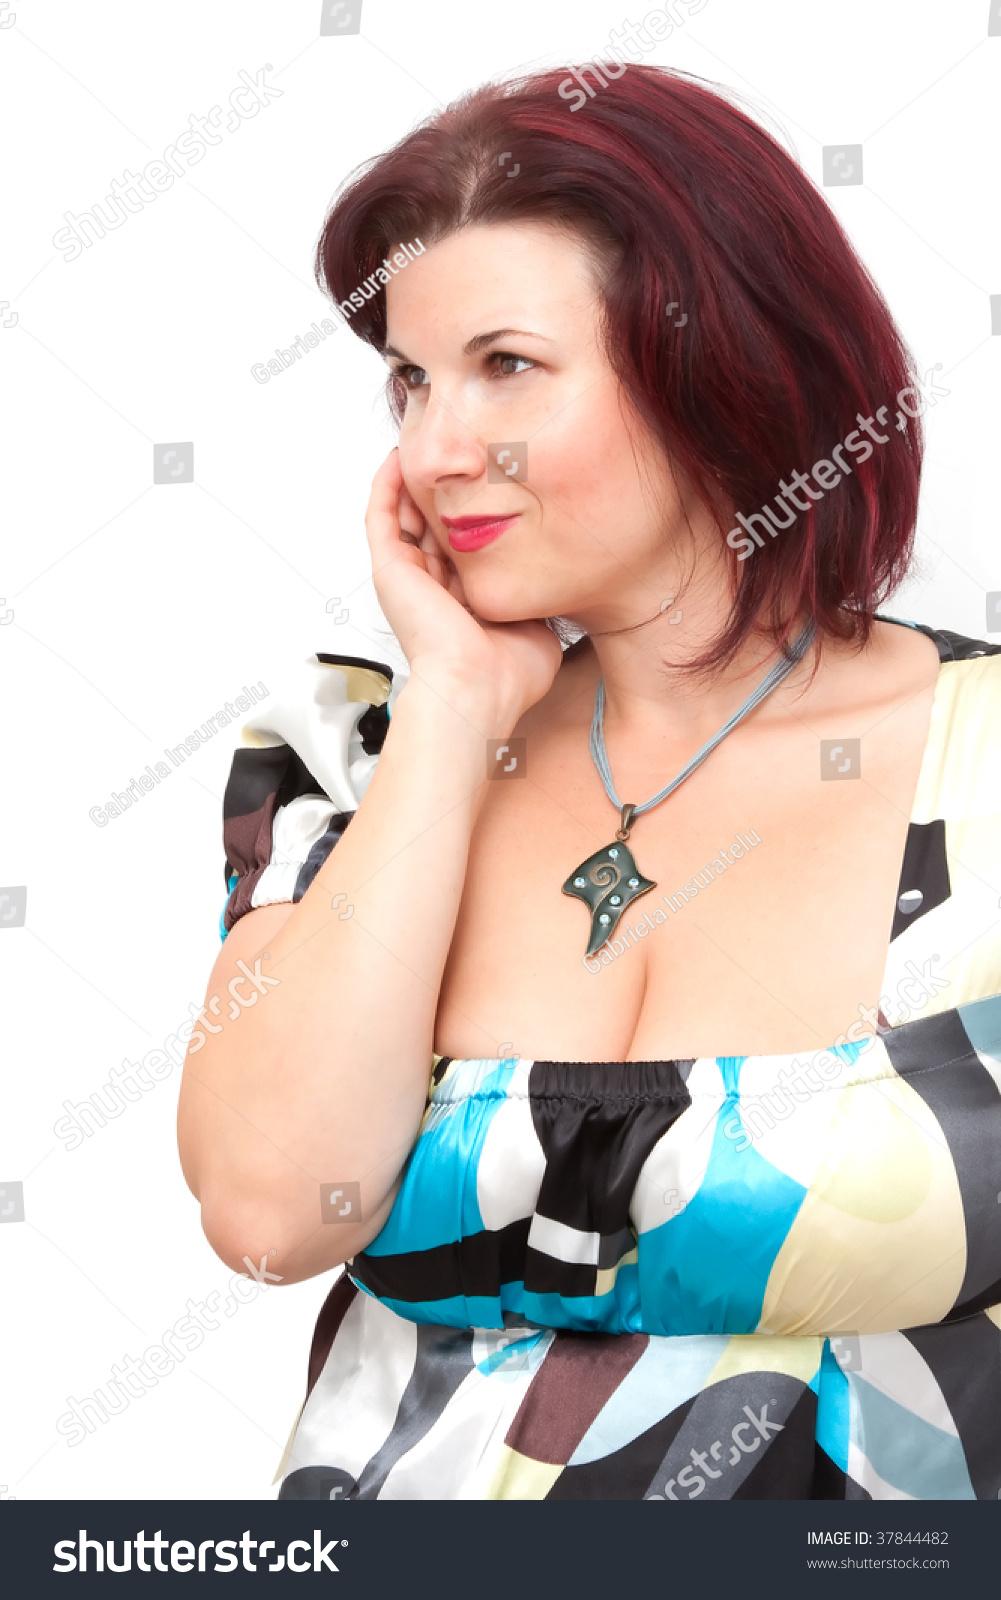 beautiful mature redhead isolated on white stock photo & image